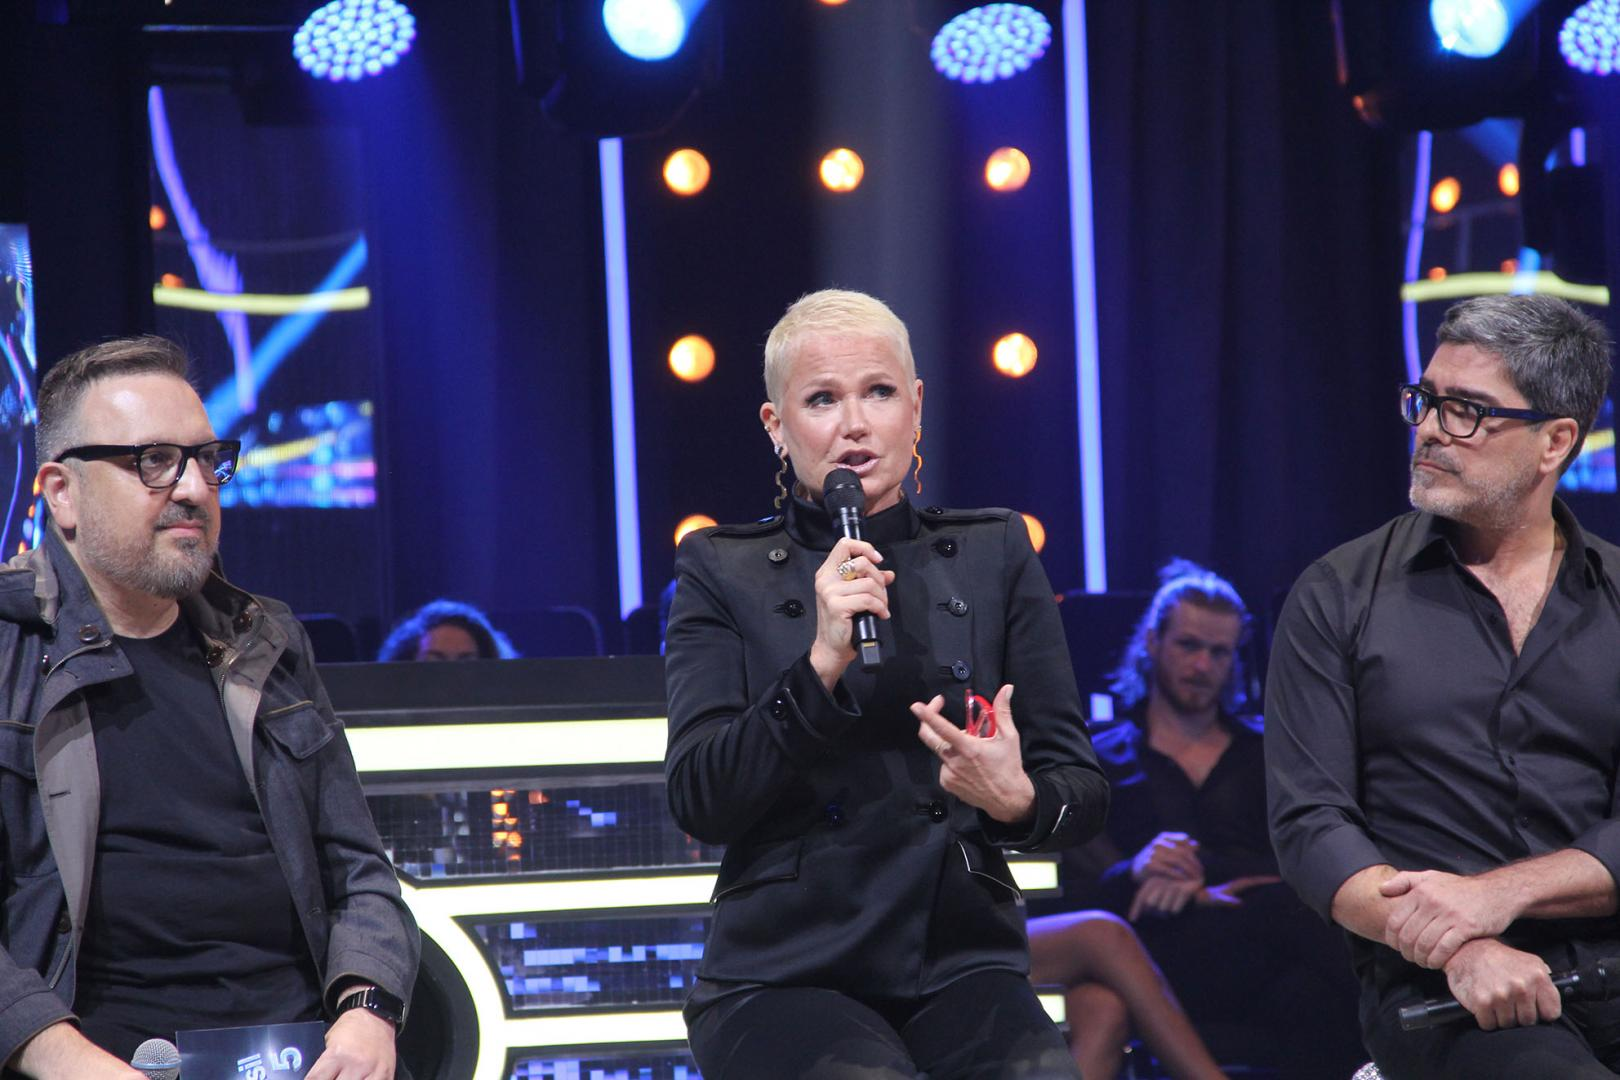 Xuxa apresenta a 5ª temporada do Dancing Brasil